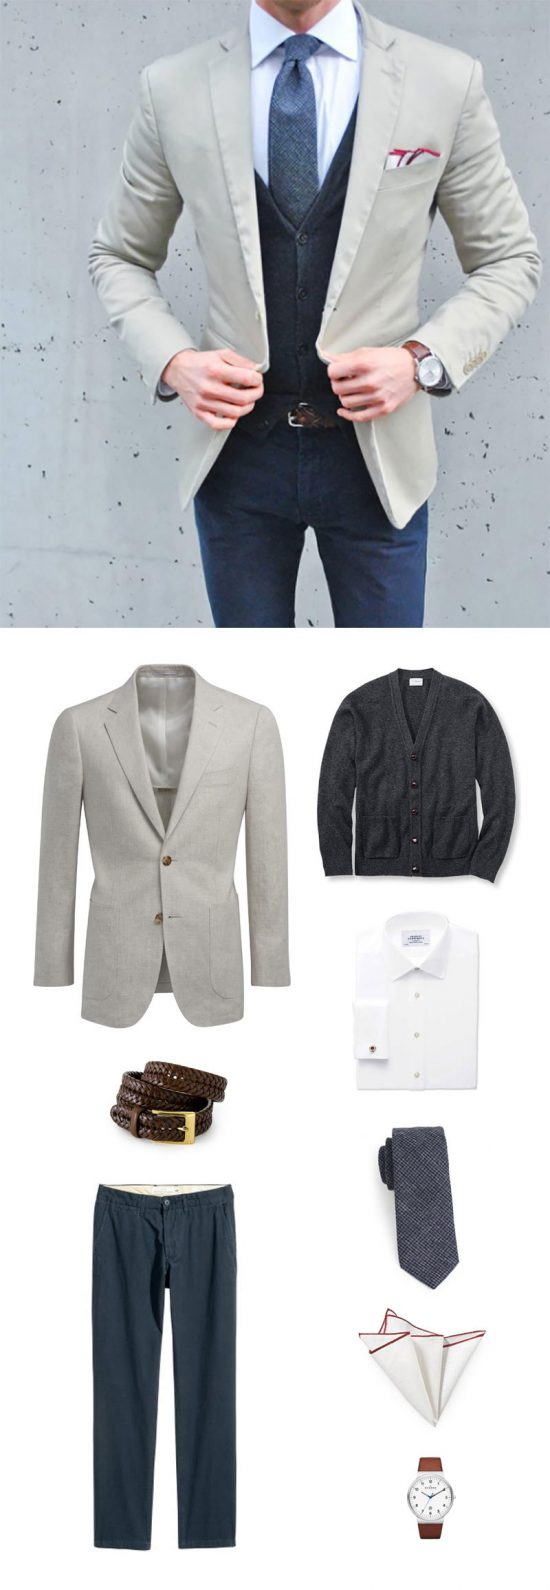 Menswear Outfit - Navy Tweed Necktie